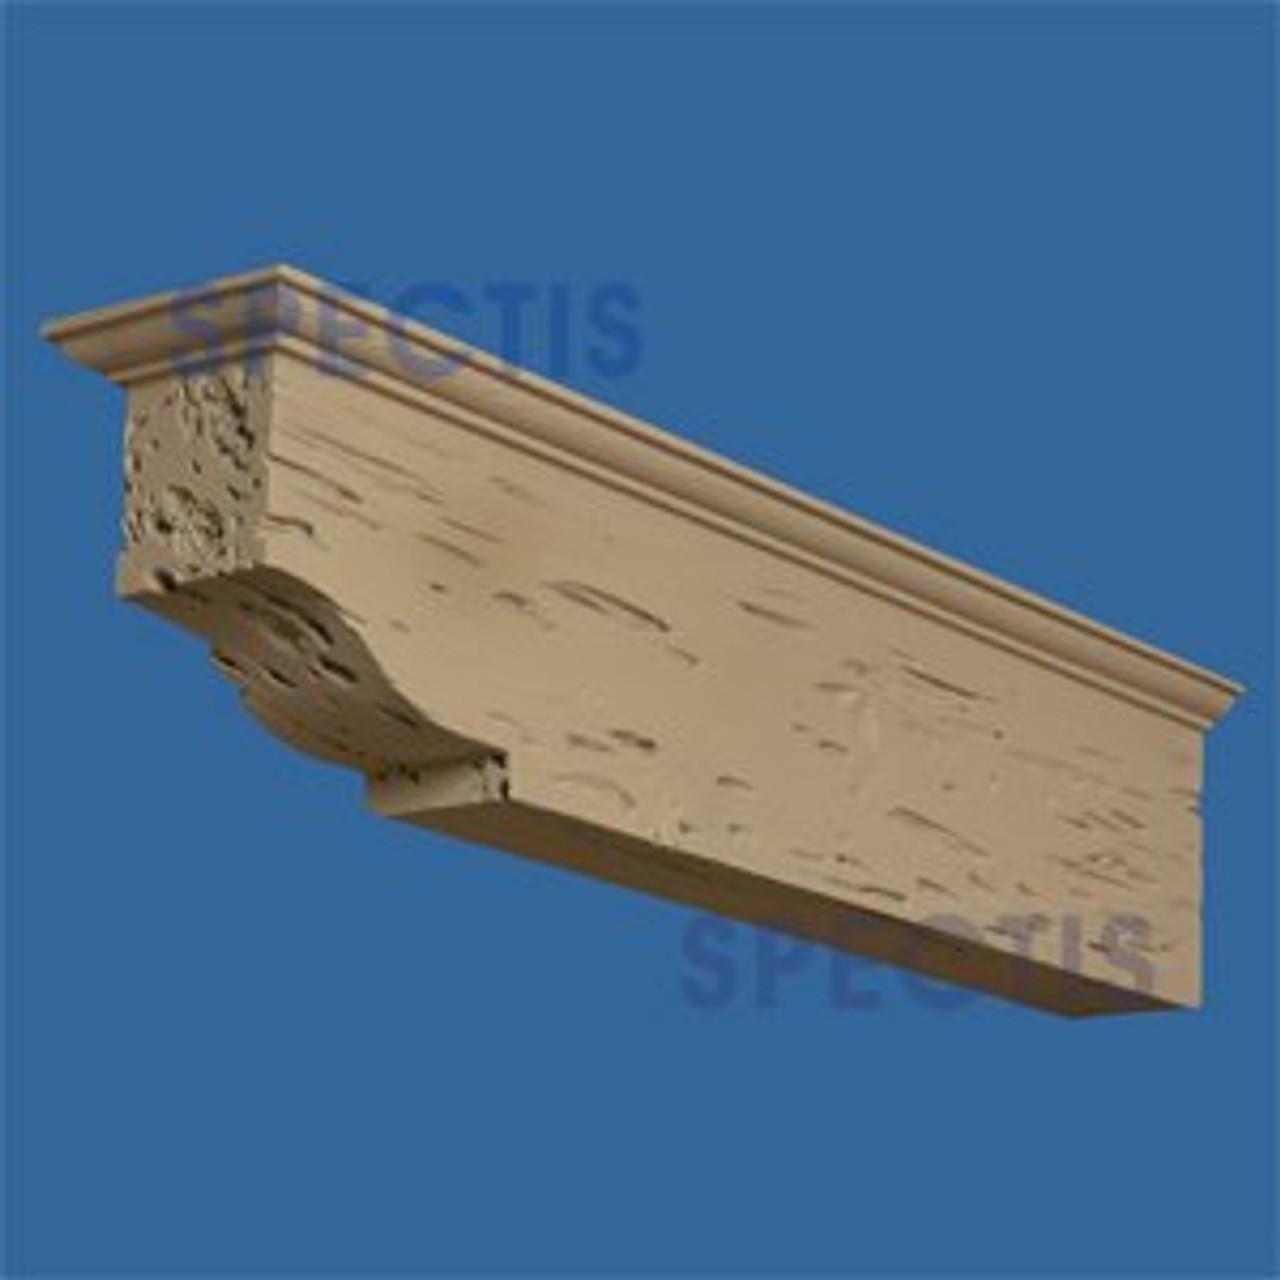 "BL2889PC Corbel Block or Eave Bracket 6.5""W x 8.75""H x 35"" P"